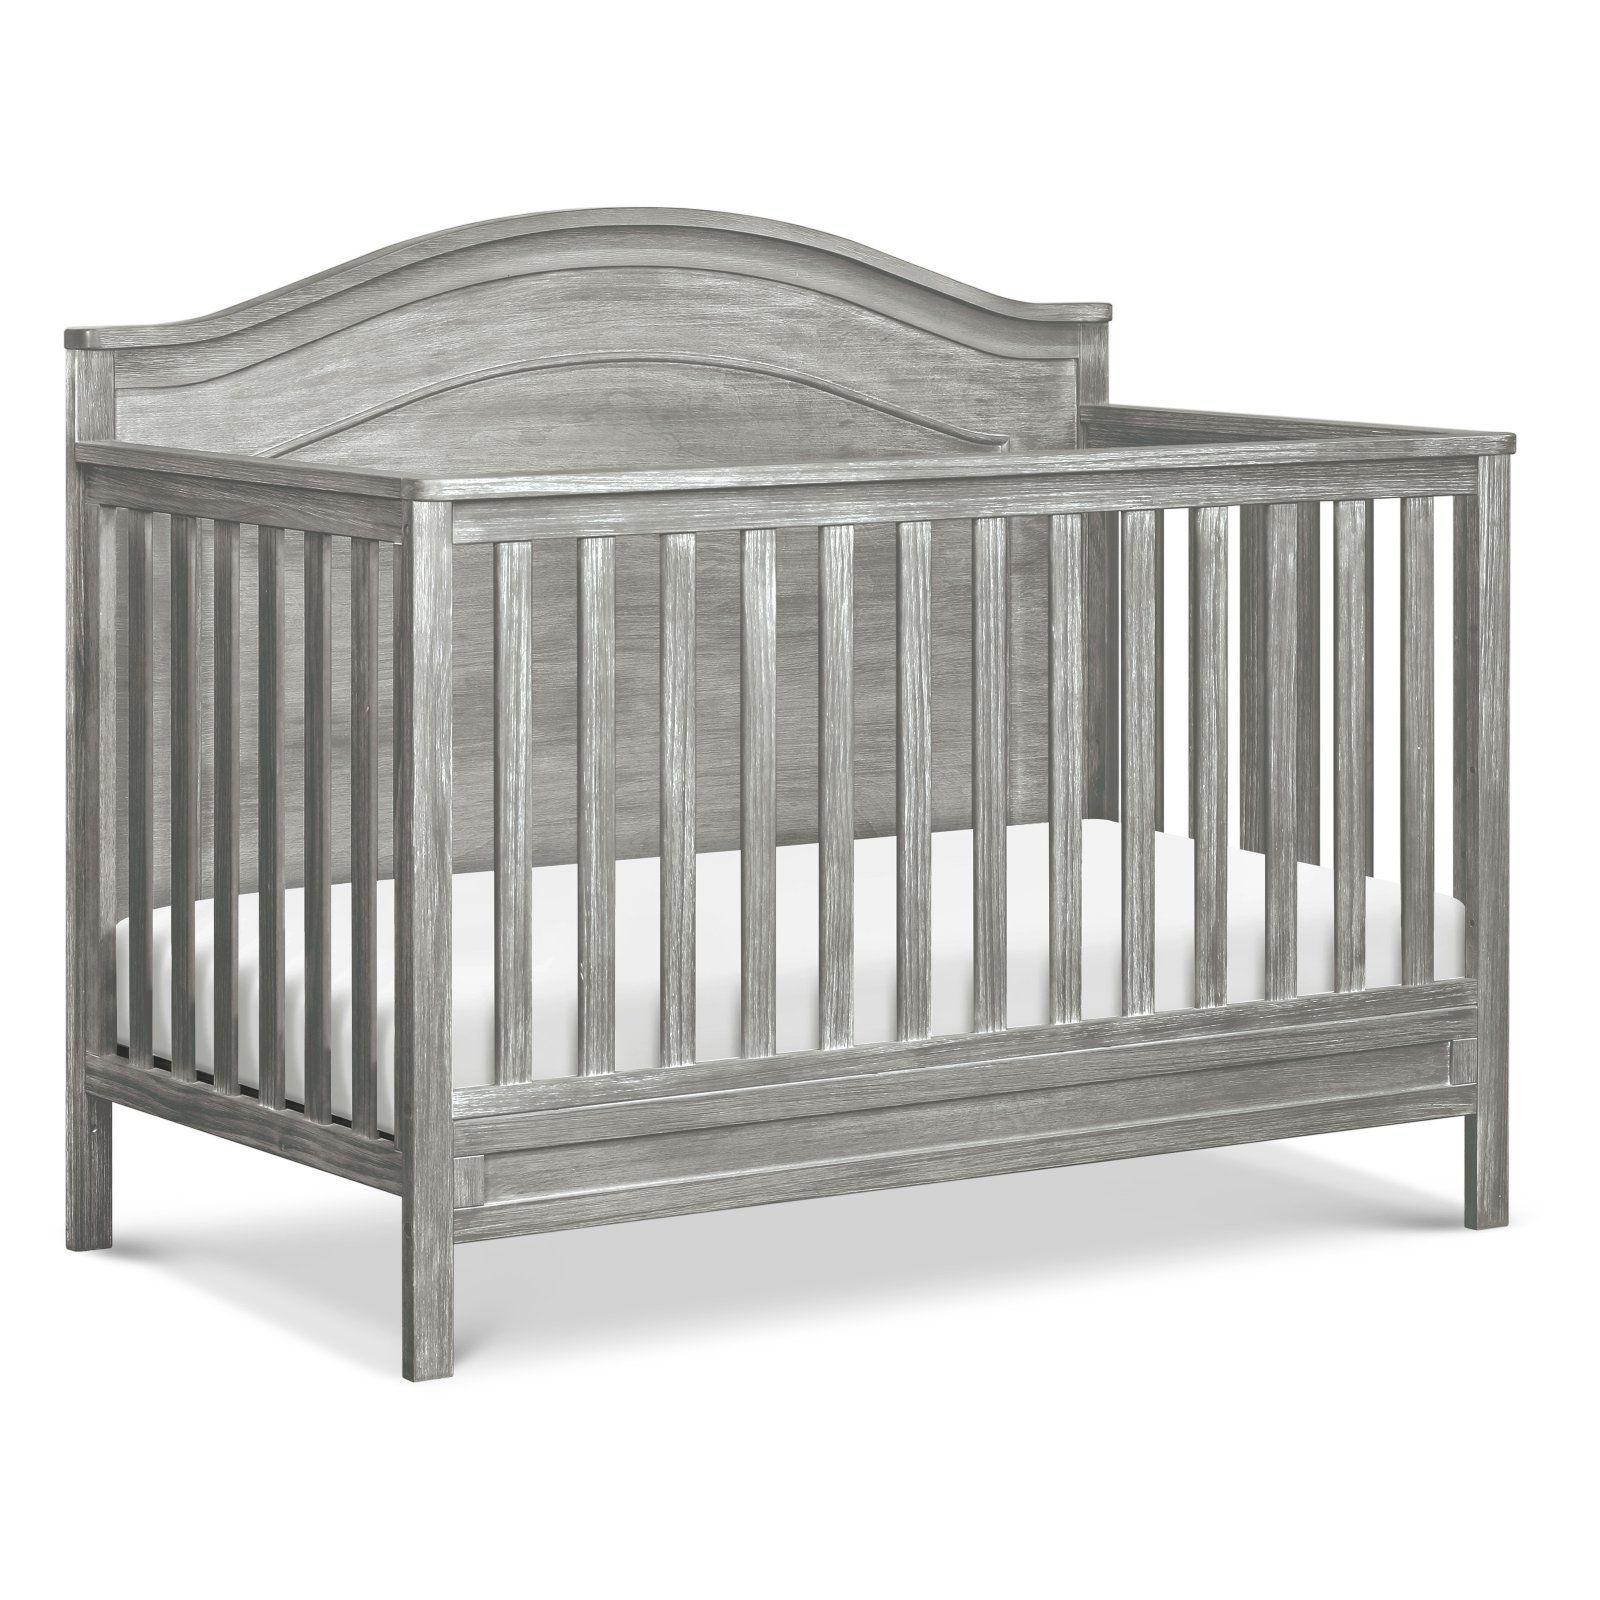 DaVinci Charlie 4 in 1 Convertible Crib Cottage Grey